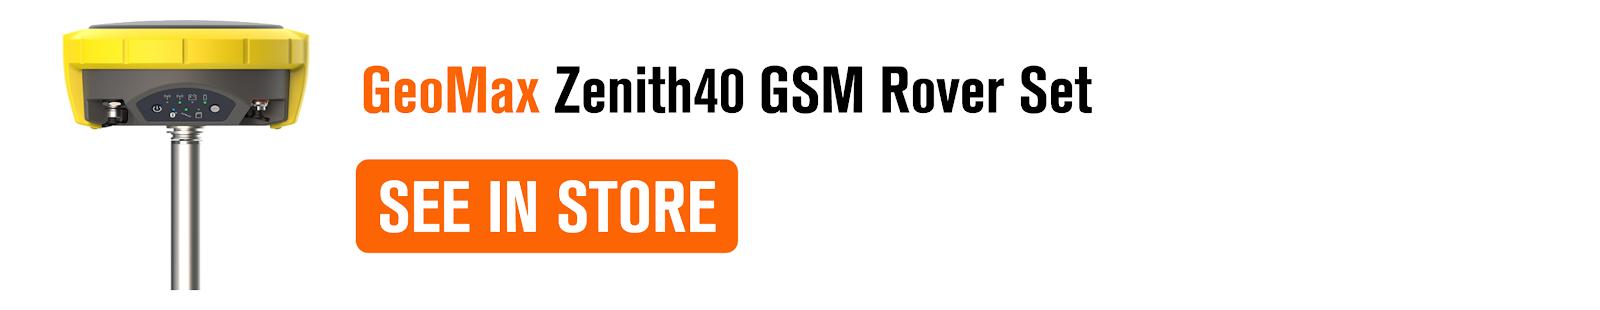 Zenith40 GNSS rover